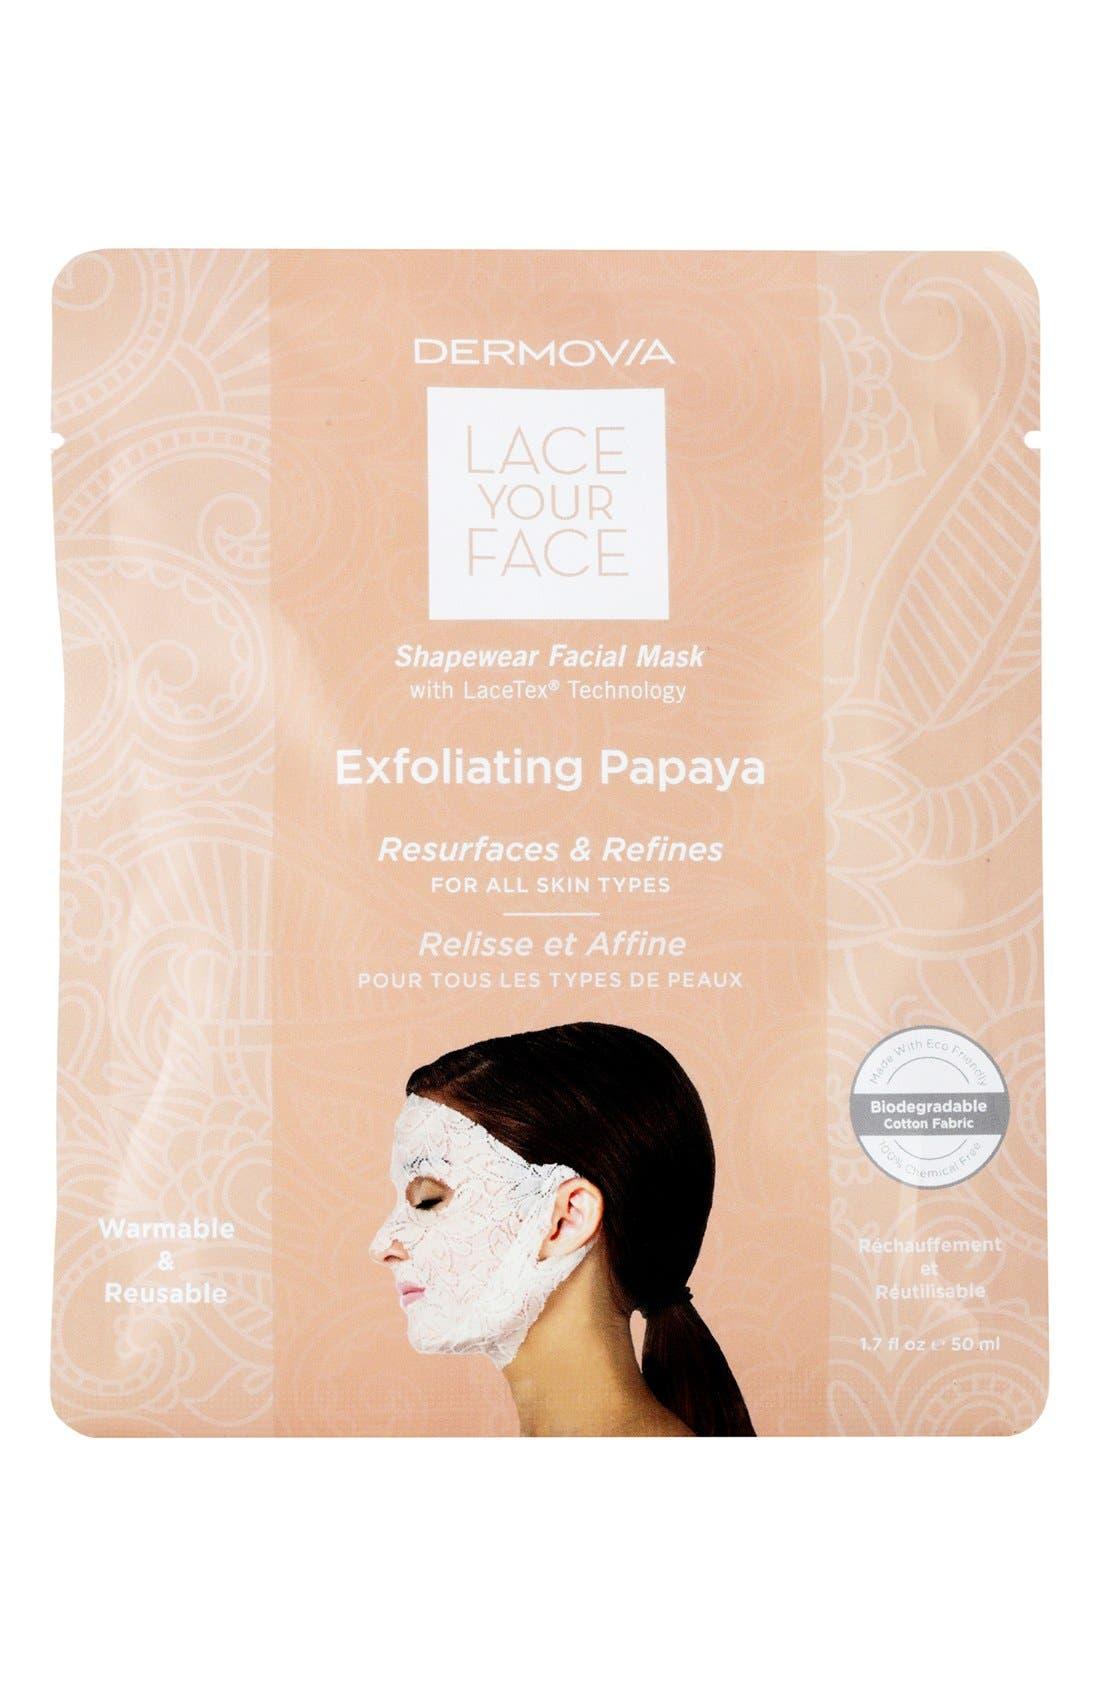 Dermovia Lace Your Face Exfoliating Papaya Compression Facial Mask